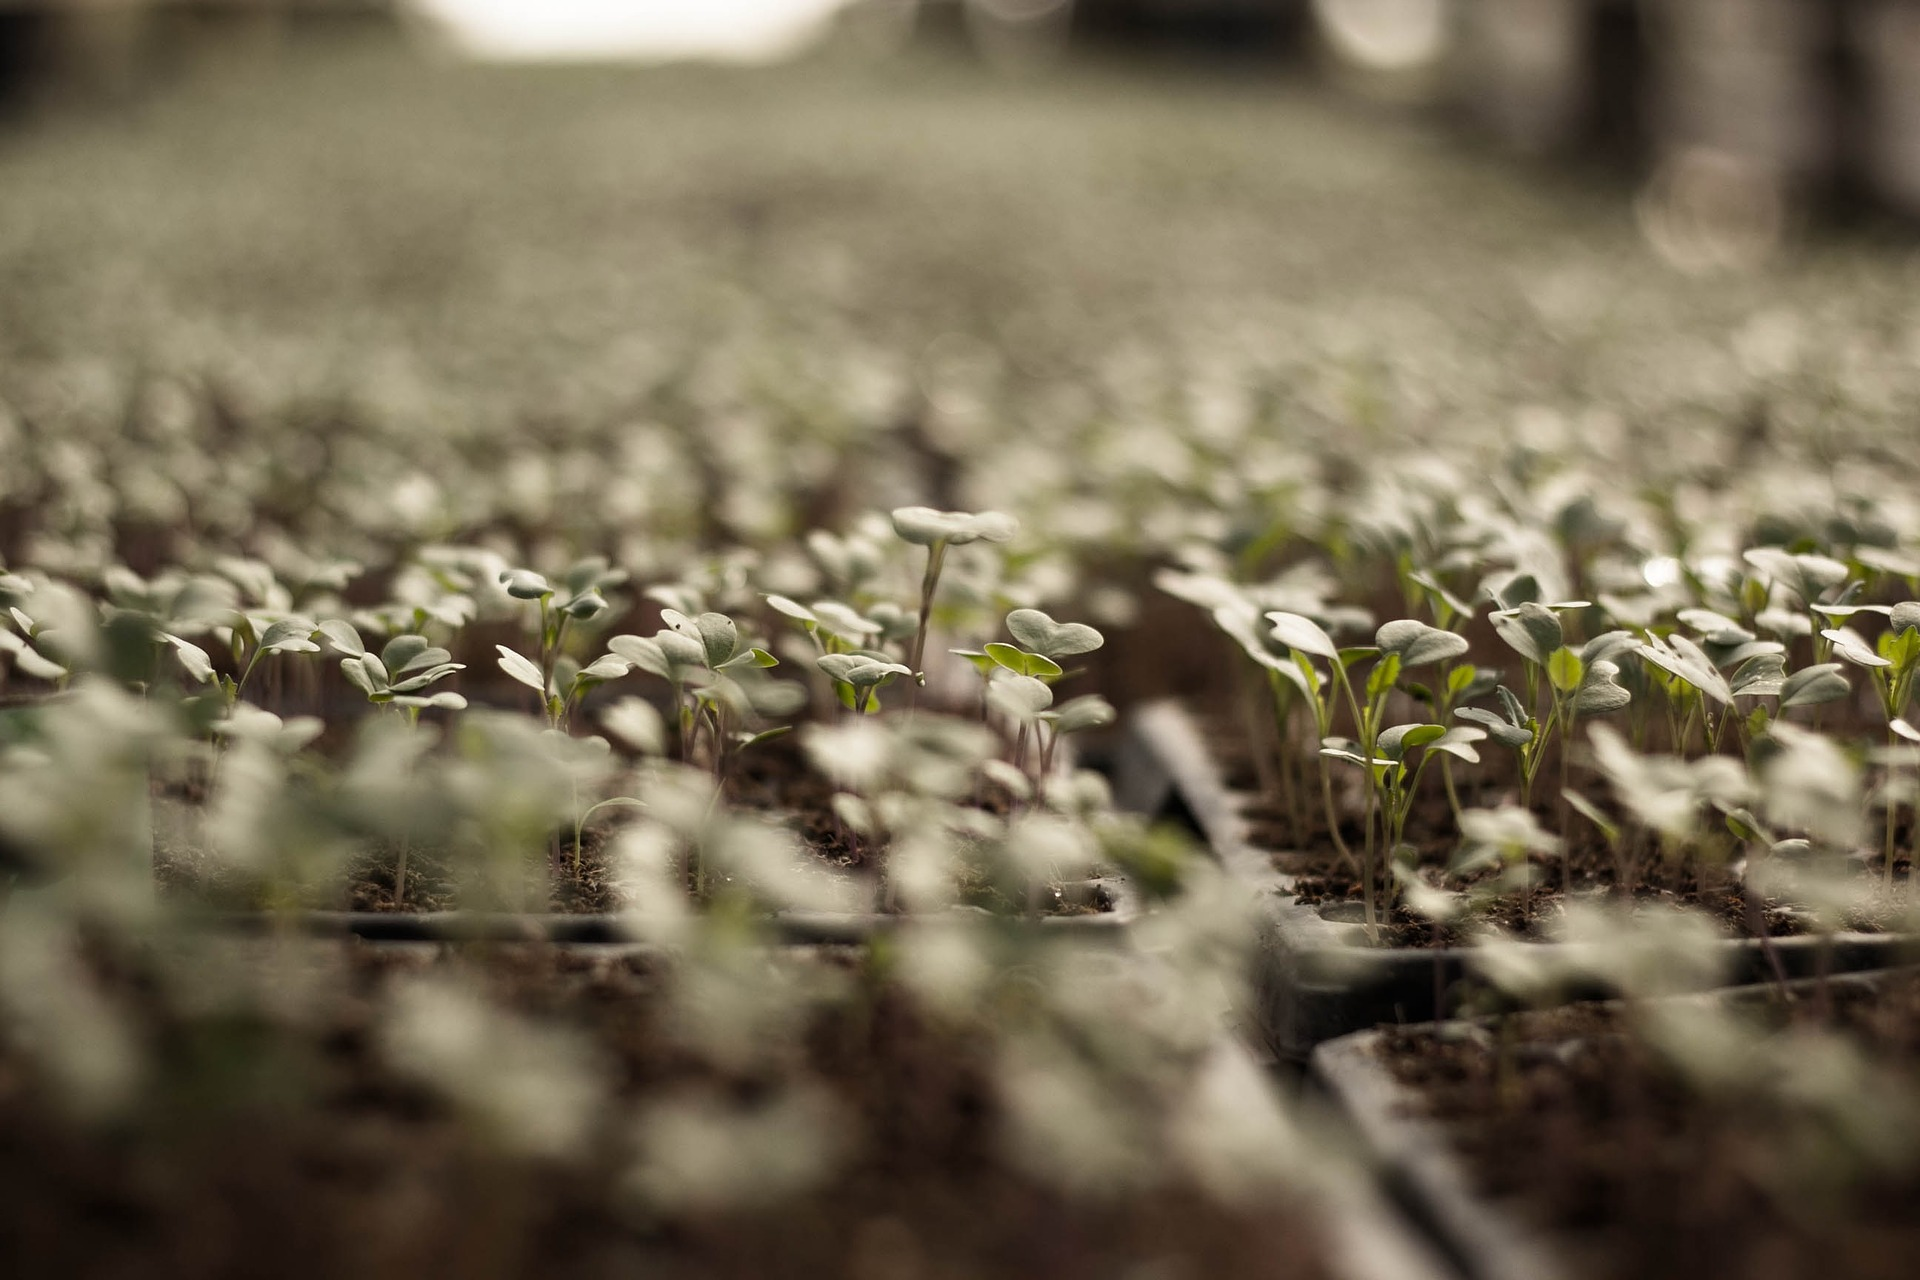 Gemüse anbauen - Keimlinge